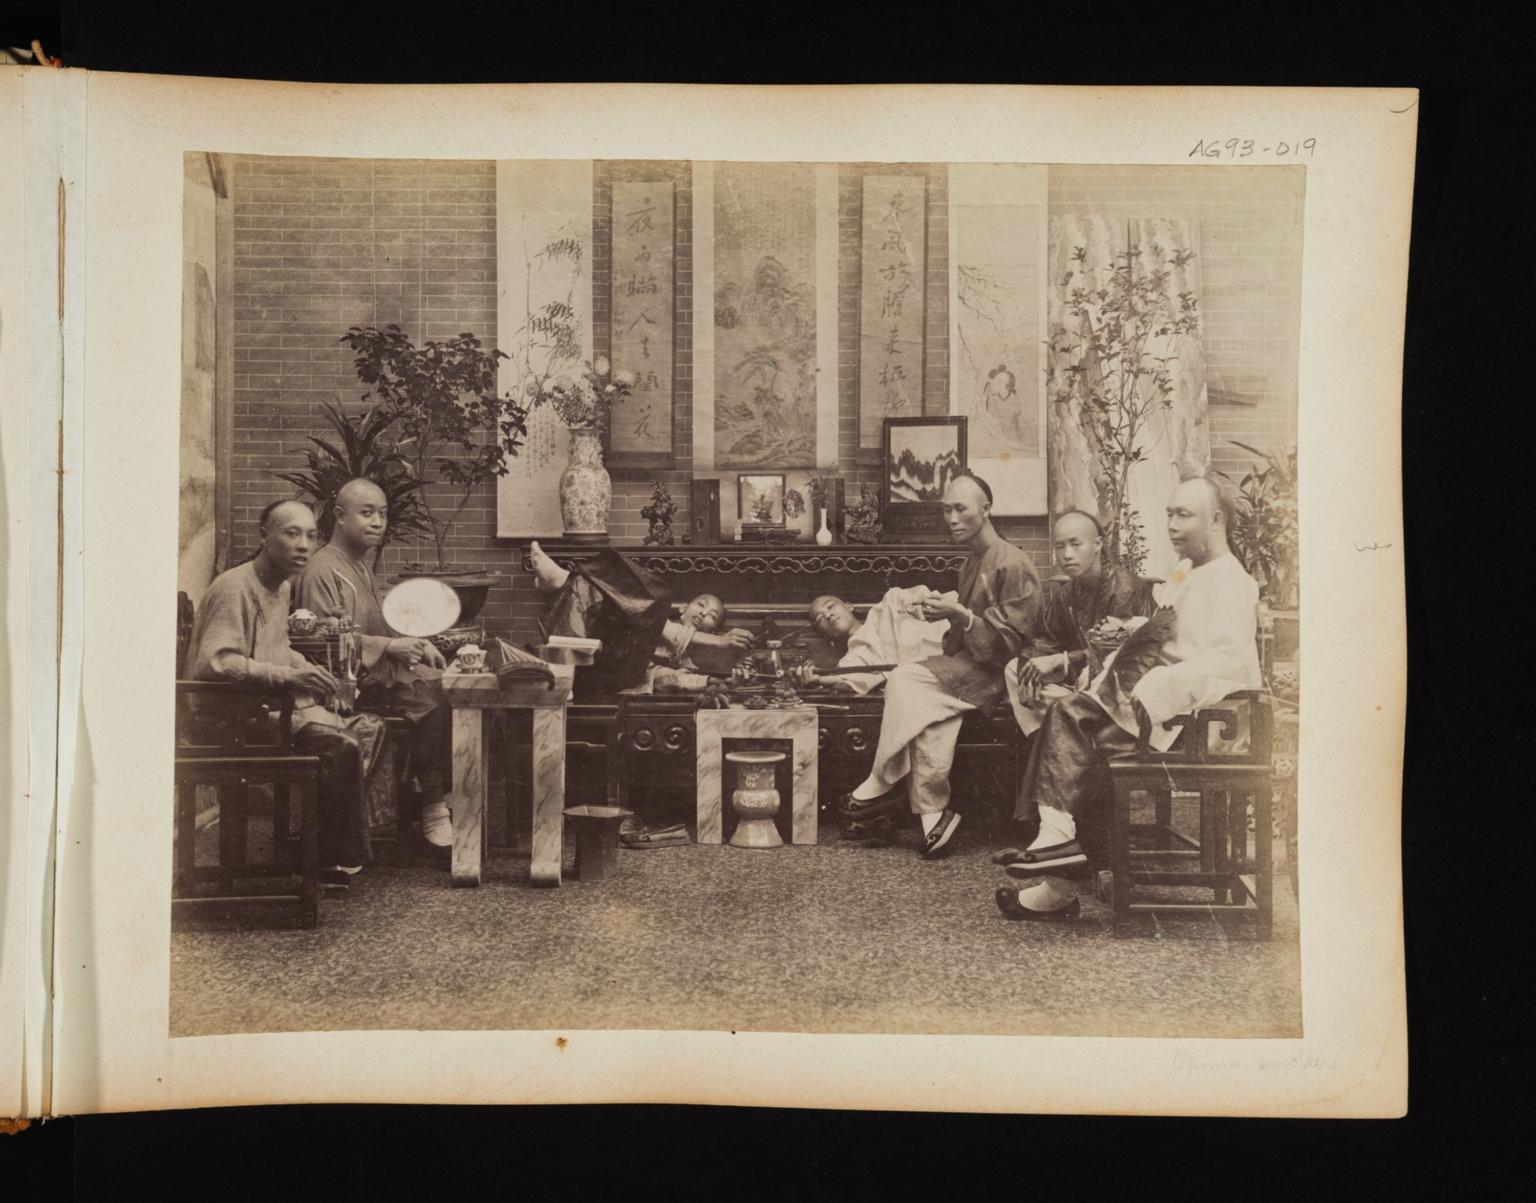 Group of seven men in an opium den in China.